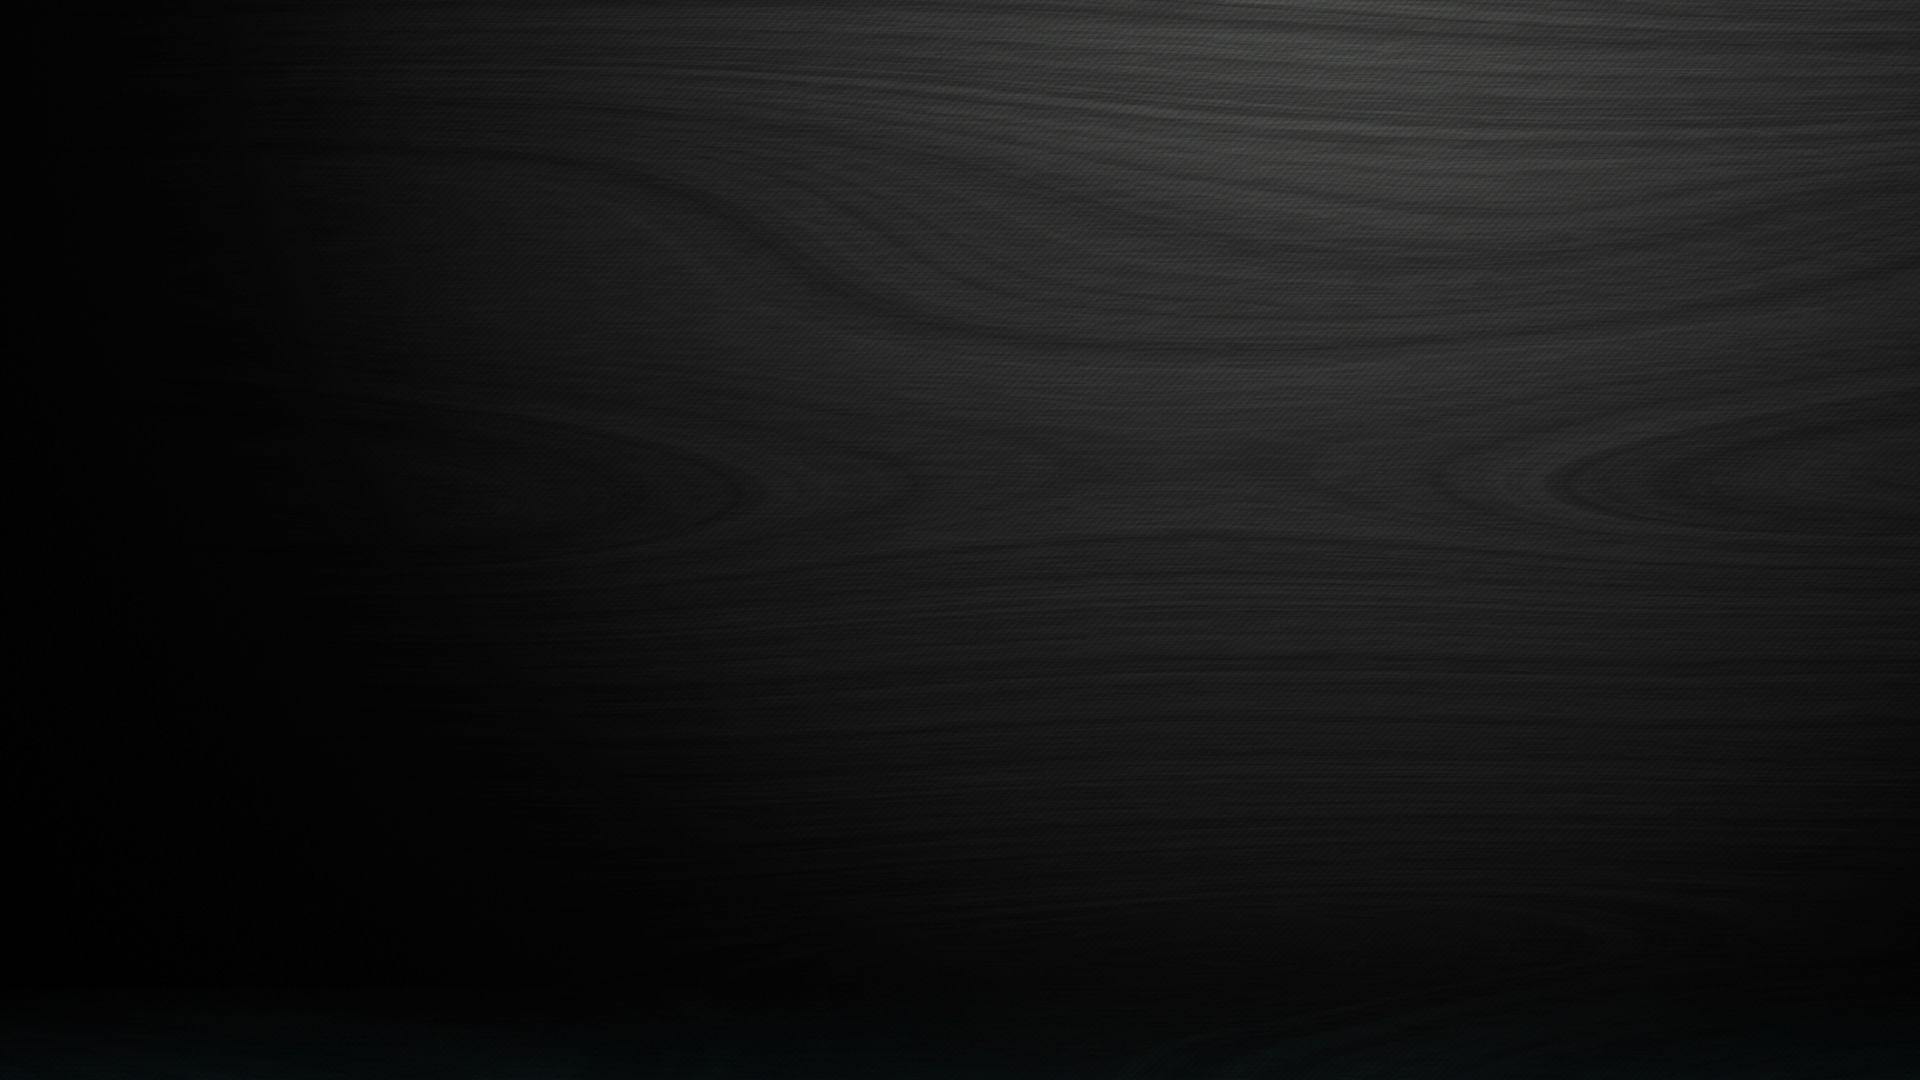 Hd Black Wallpapers 1080p Wallpaper Cave